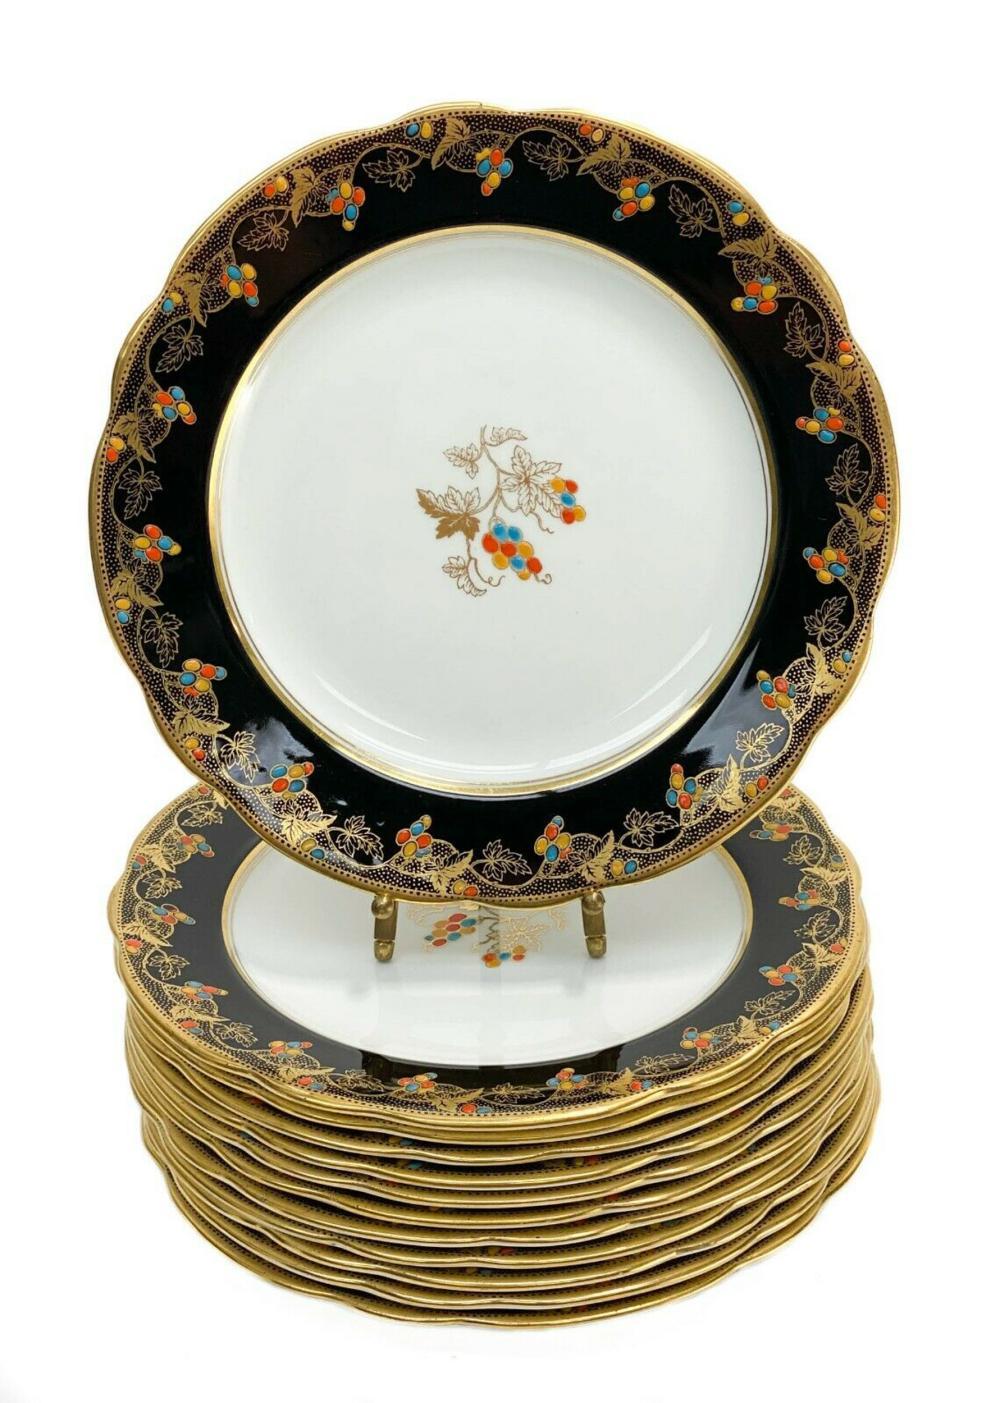 12 Aynsley Porcelain Dessert Plates with Enamel